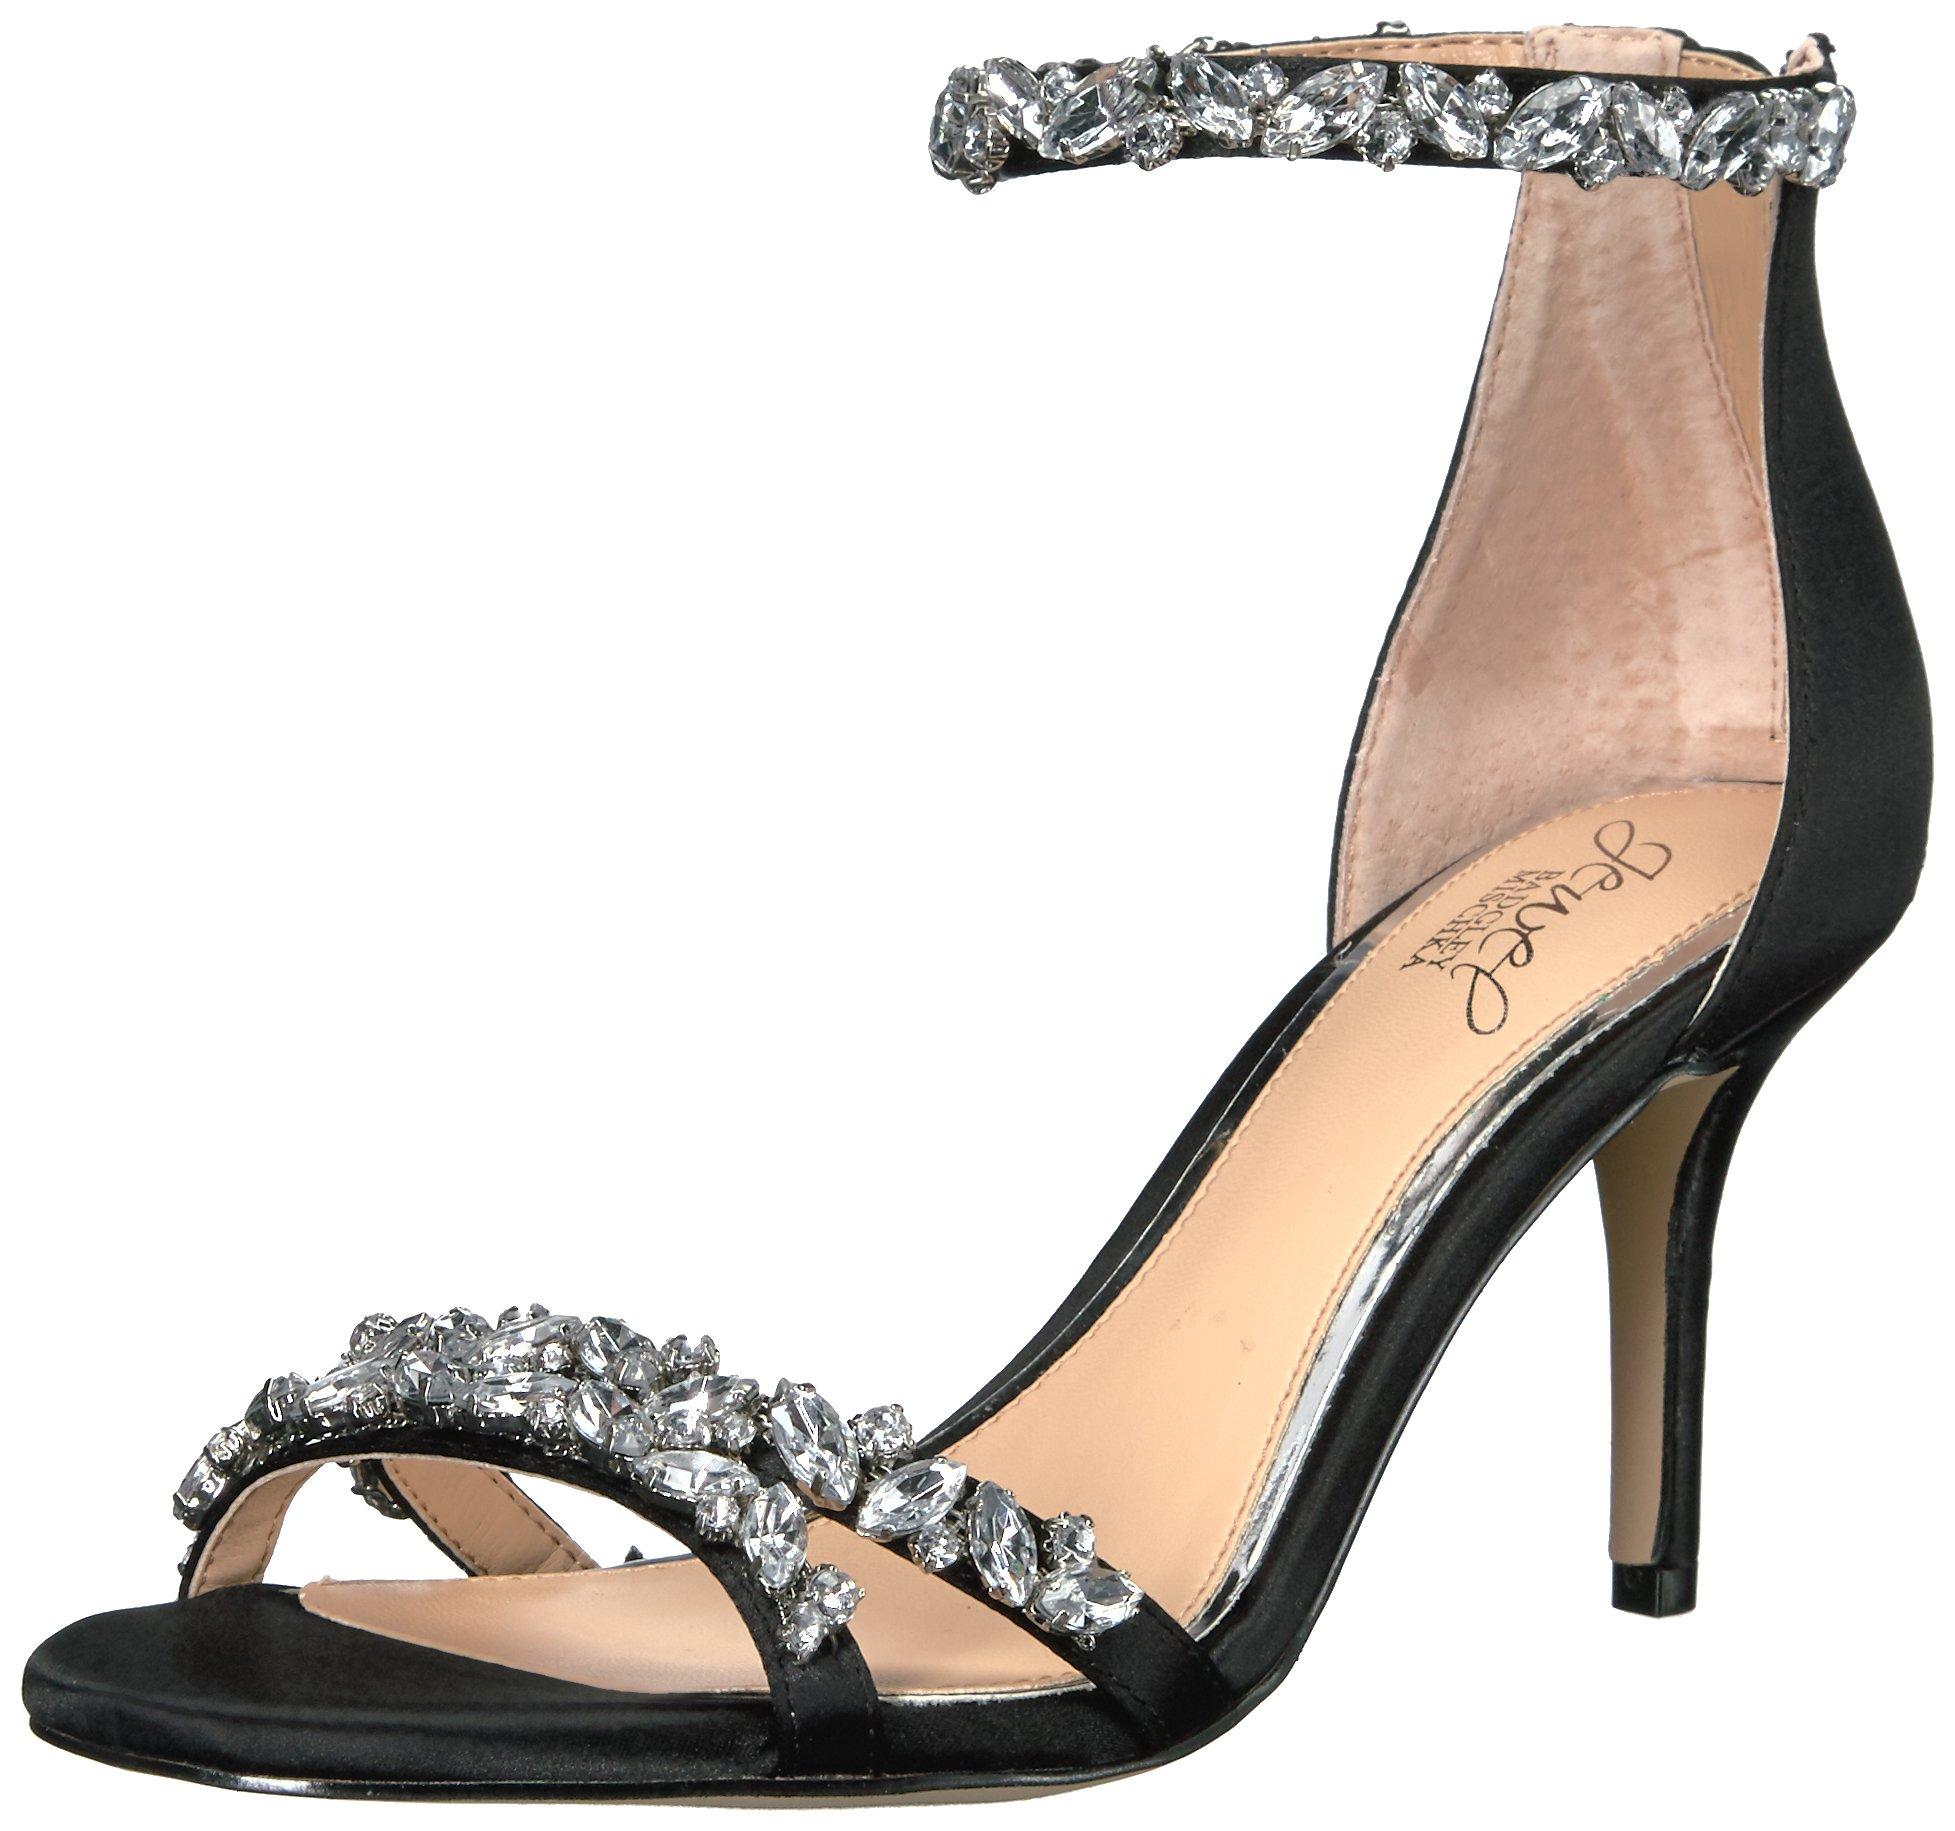 Jewel Badgley Mischka Women's Caroline Dress Sandal, Black, 6.5 M US